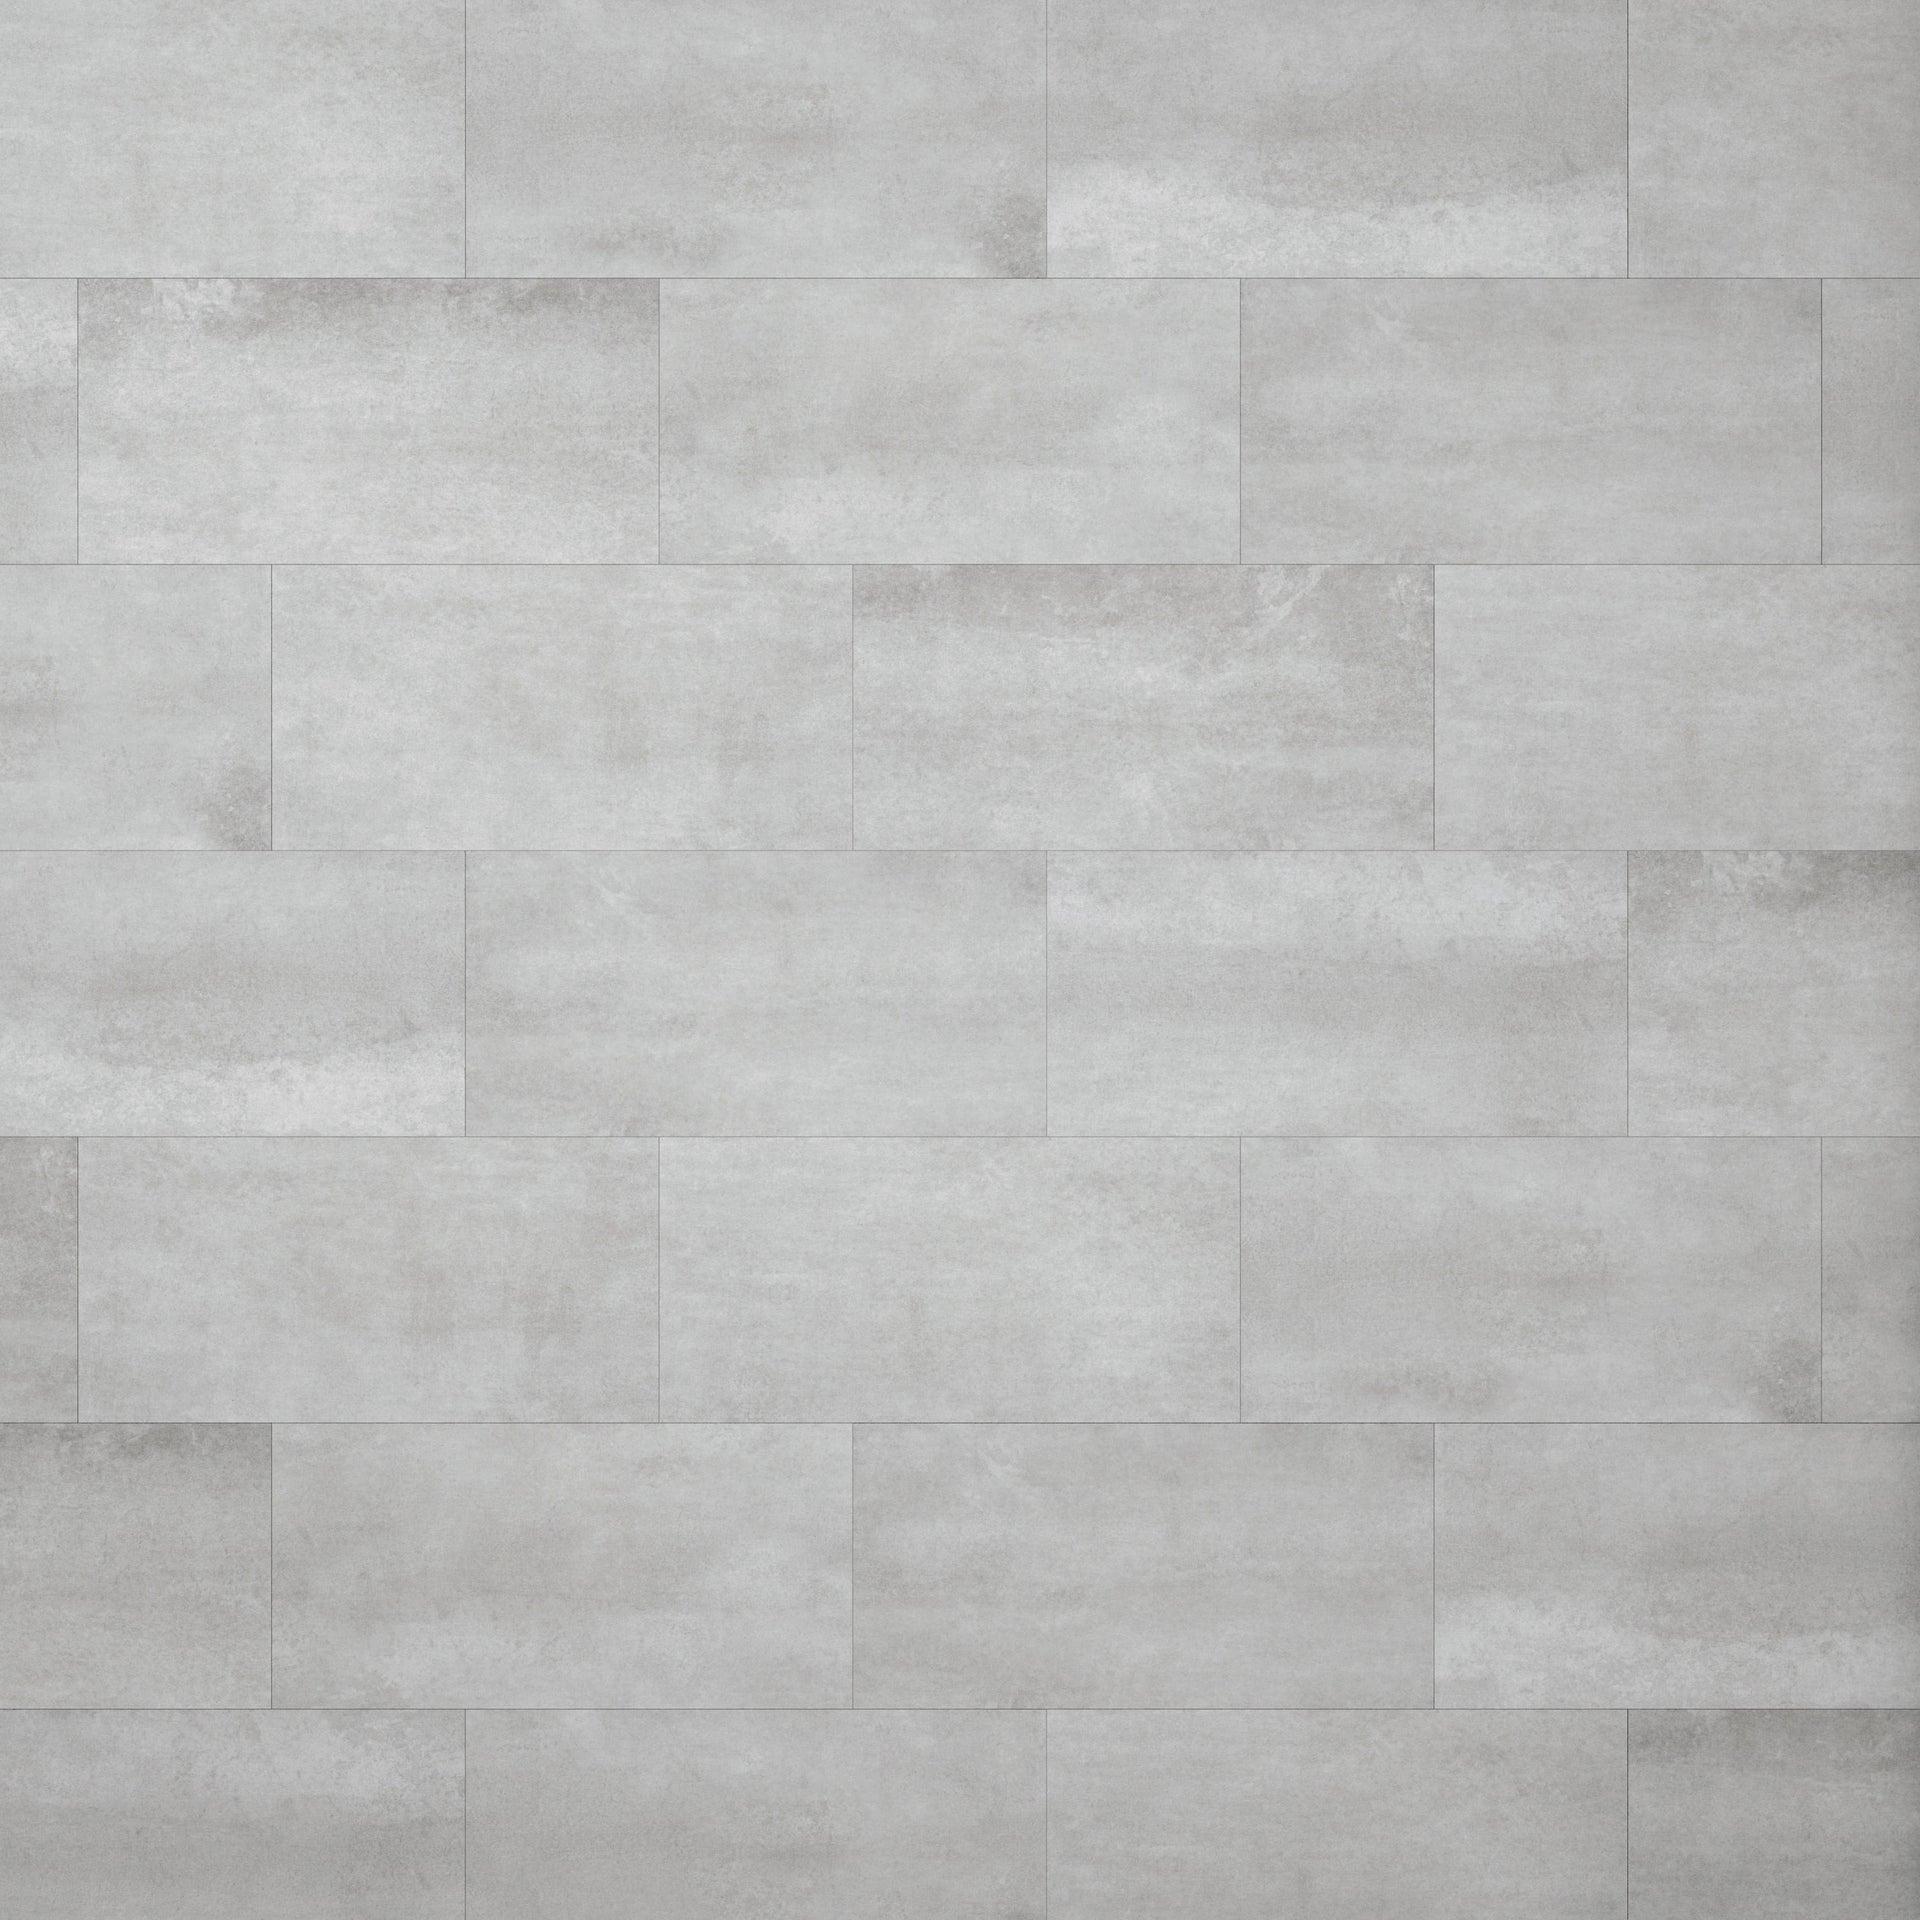 Pavimento PVC adesivo Concrete Sp 1.5 mm grigio / argento - 2